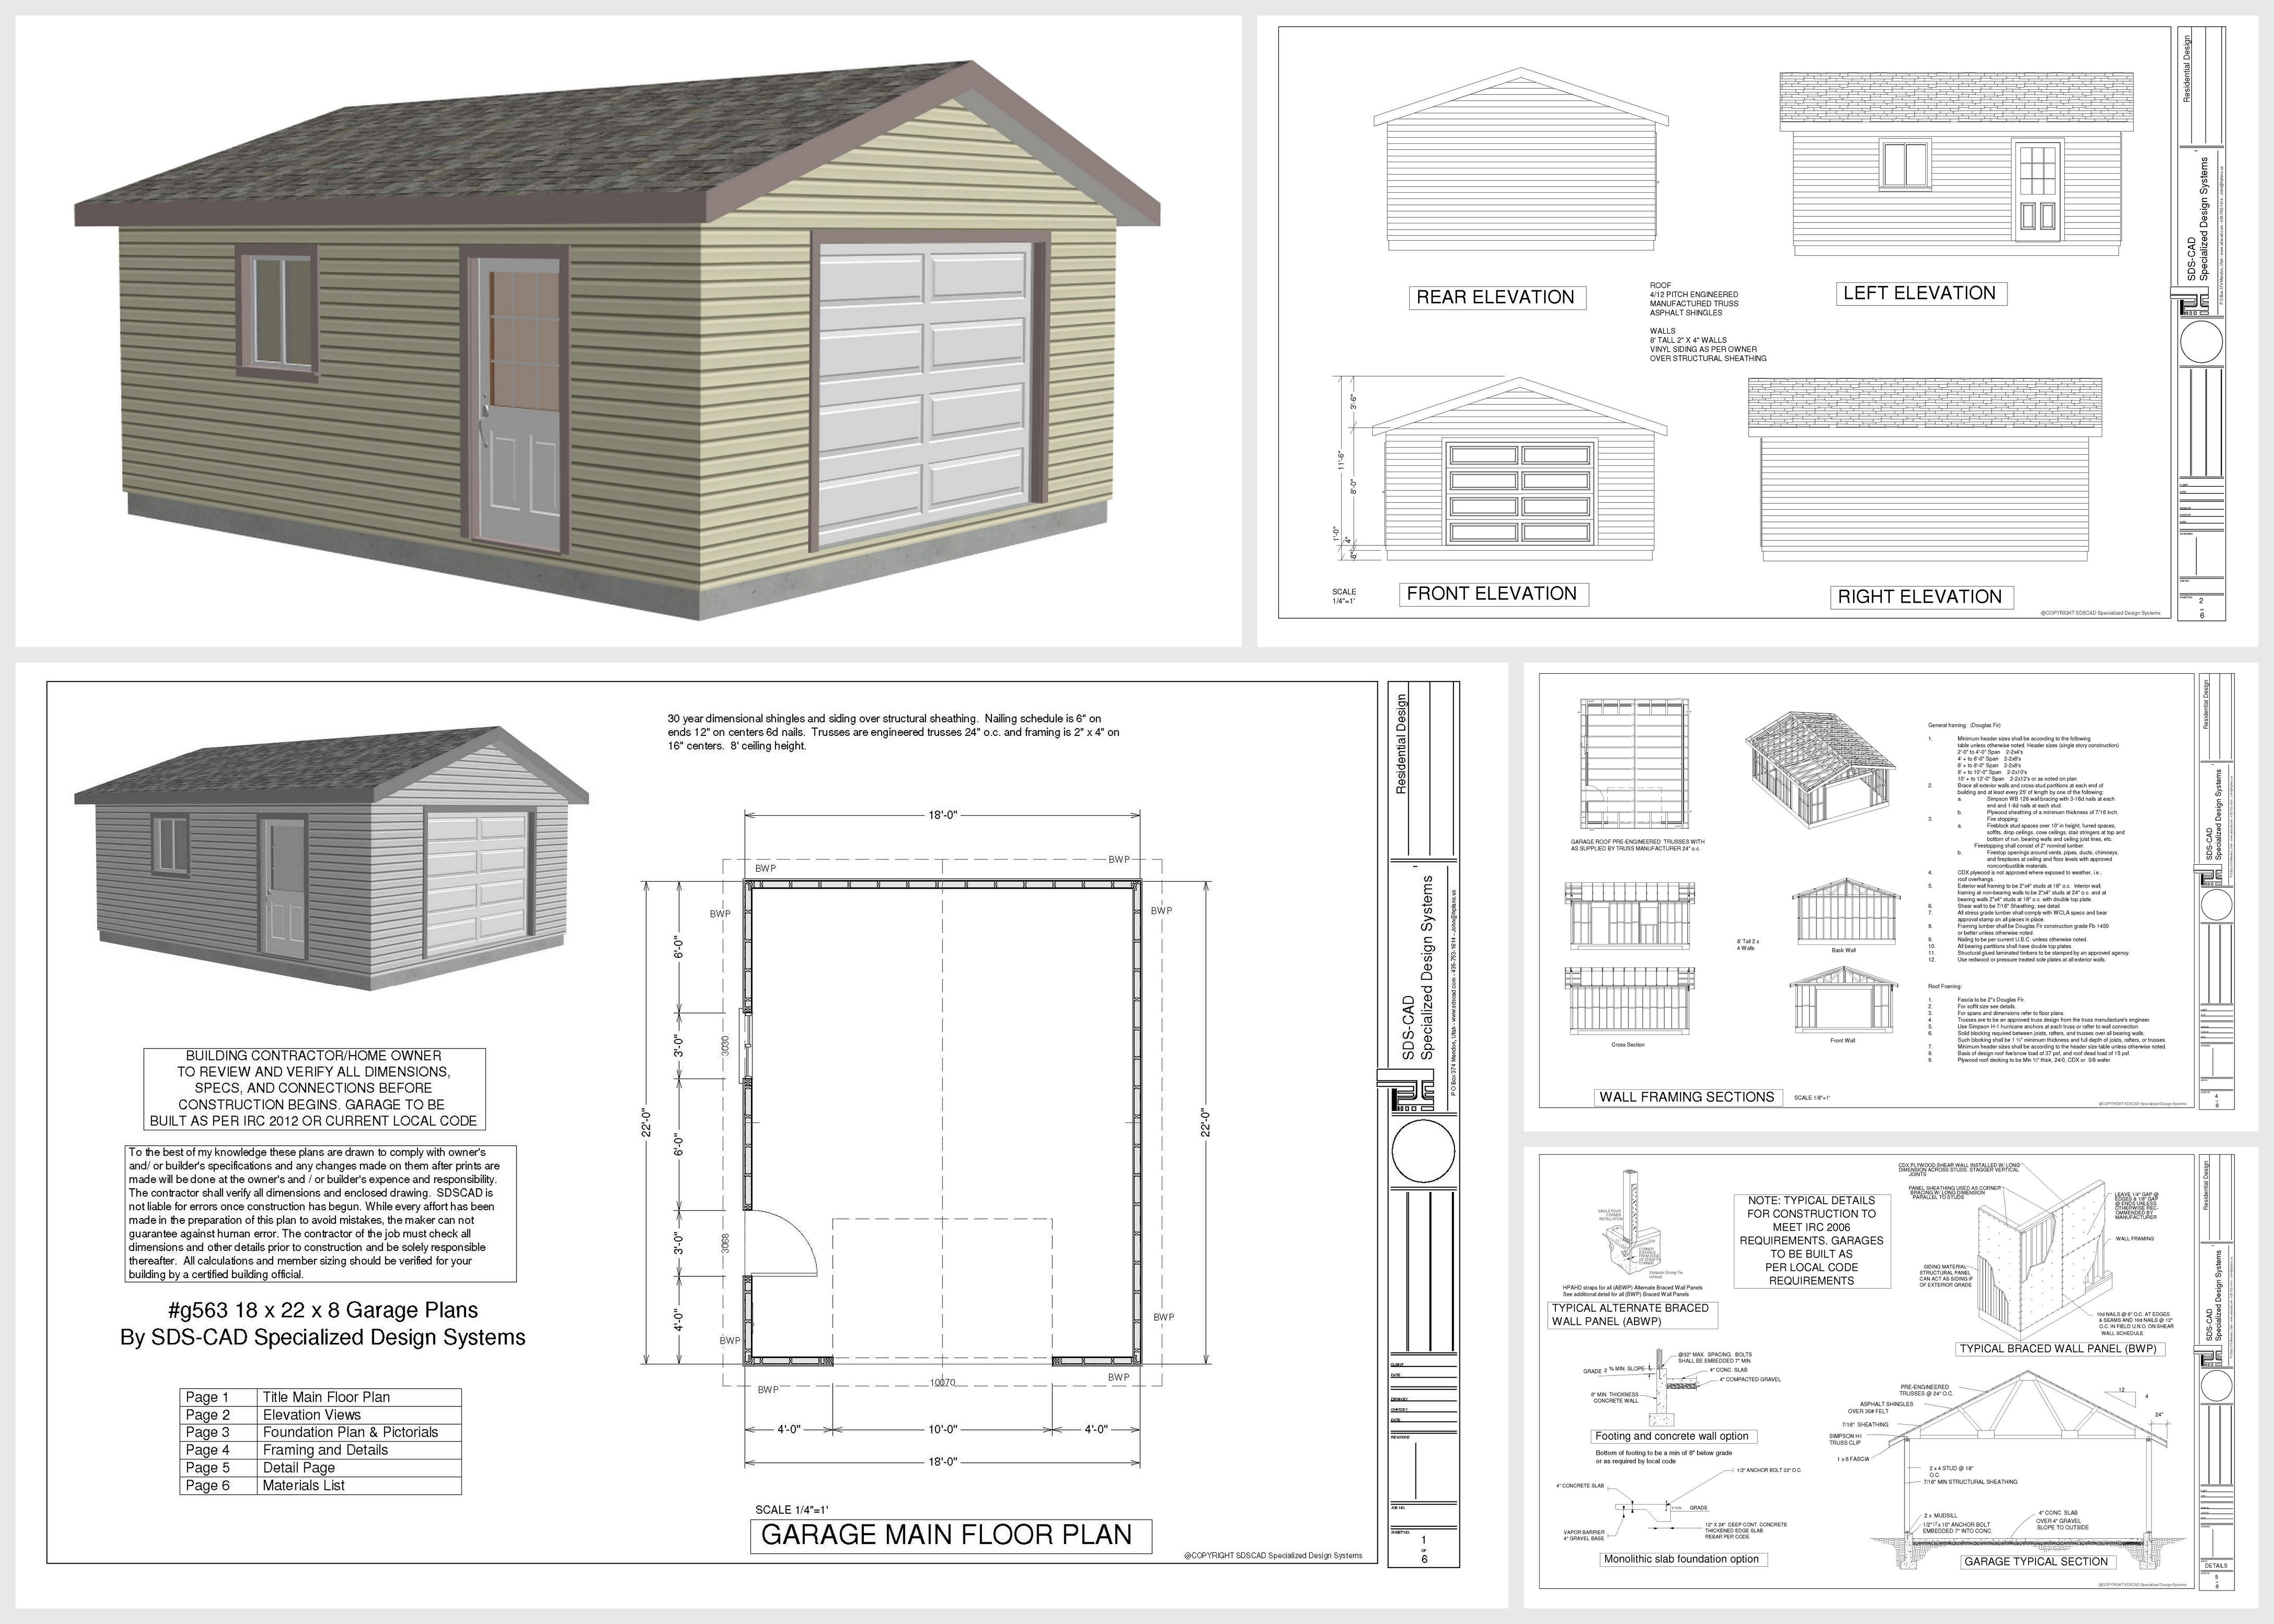 Incredible Download Free 18 X 22 Garage Plans Sdsplans Com Garage Largest Home Design Picture Inspirations Pitcheantrous